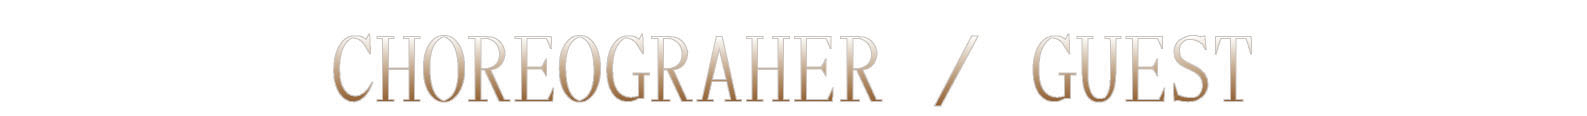 heels_logo